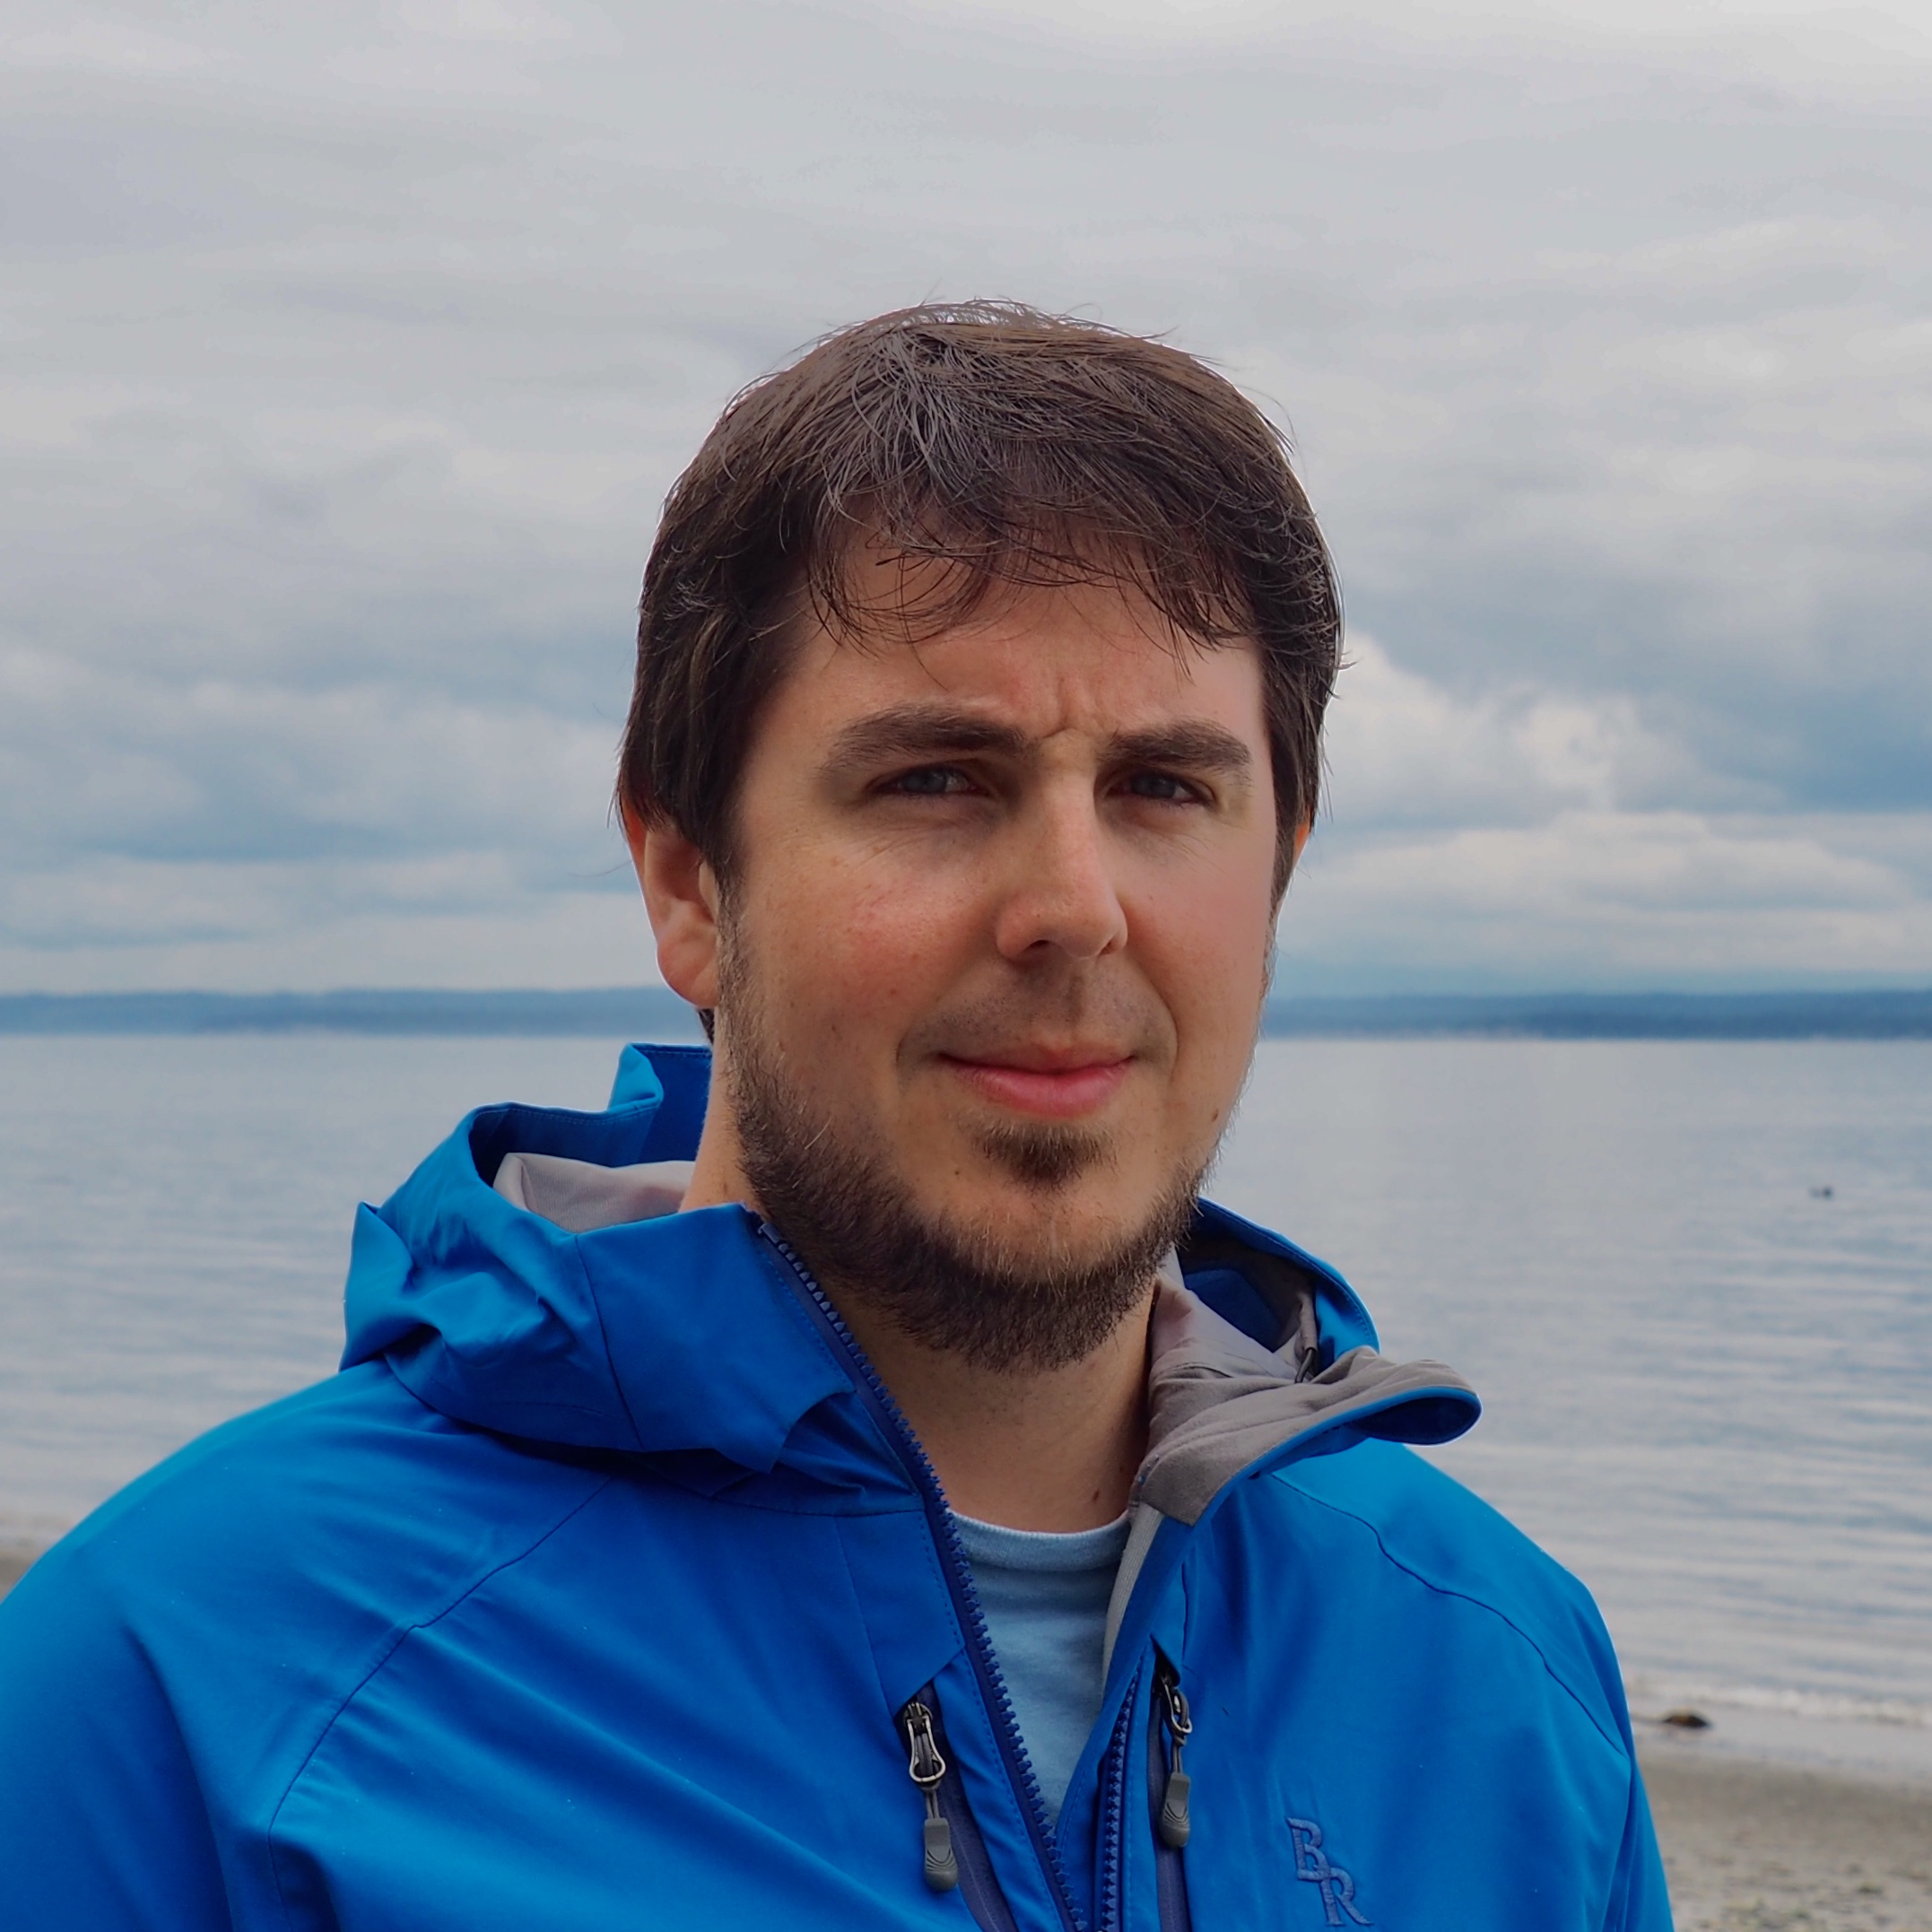 Andrew DeLaFrance headshot